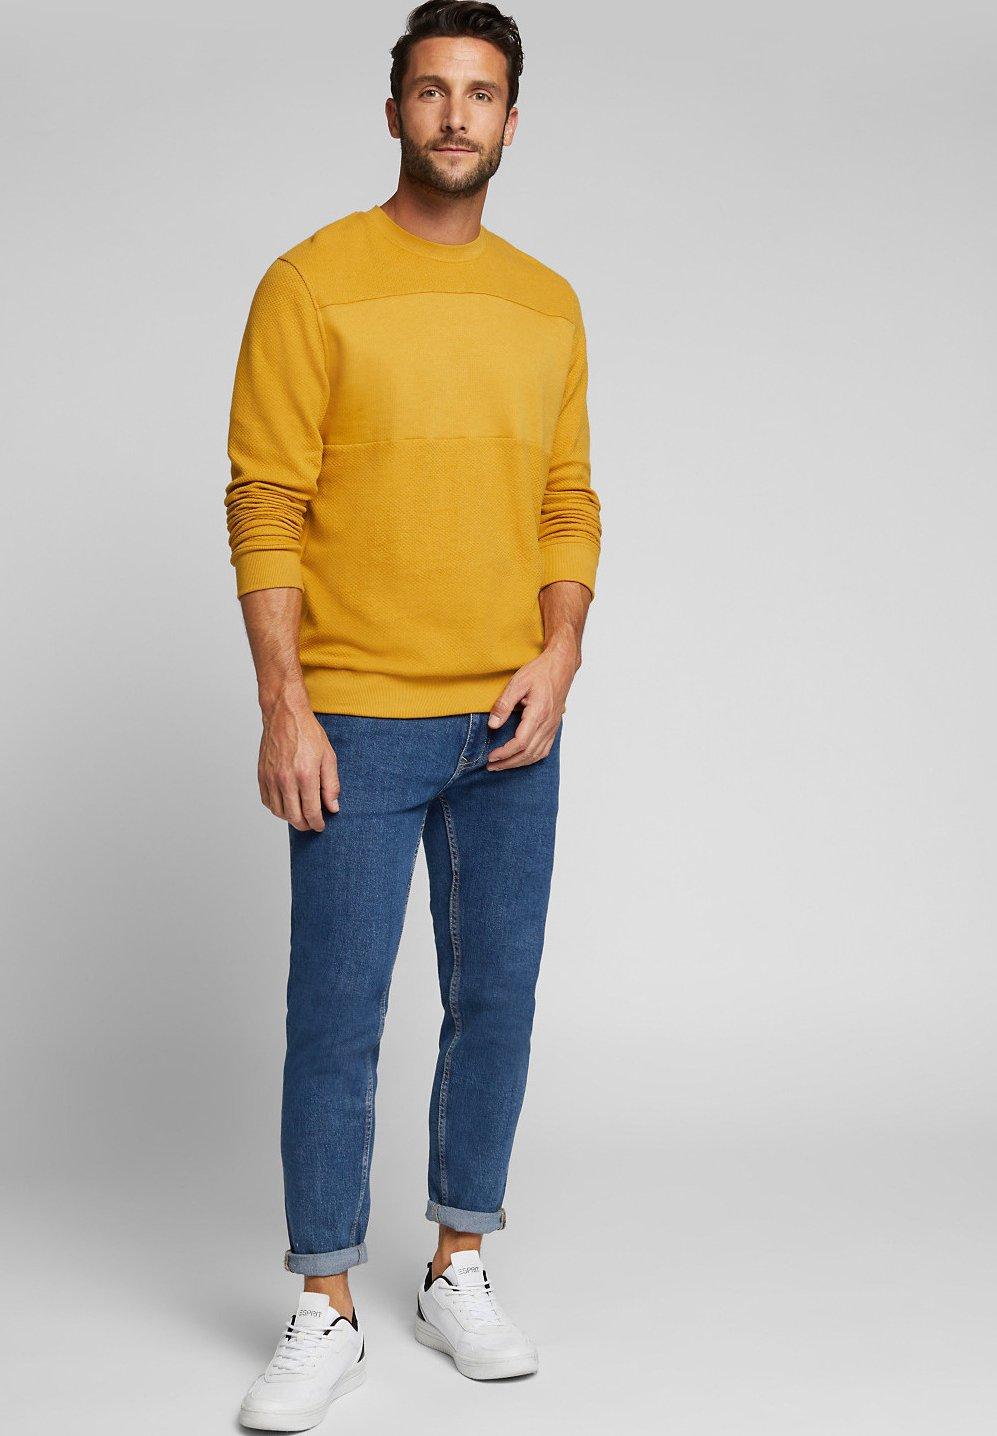 Esprit Sweatshirt amber yellowsenf Zalando.at